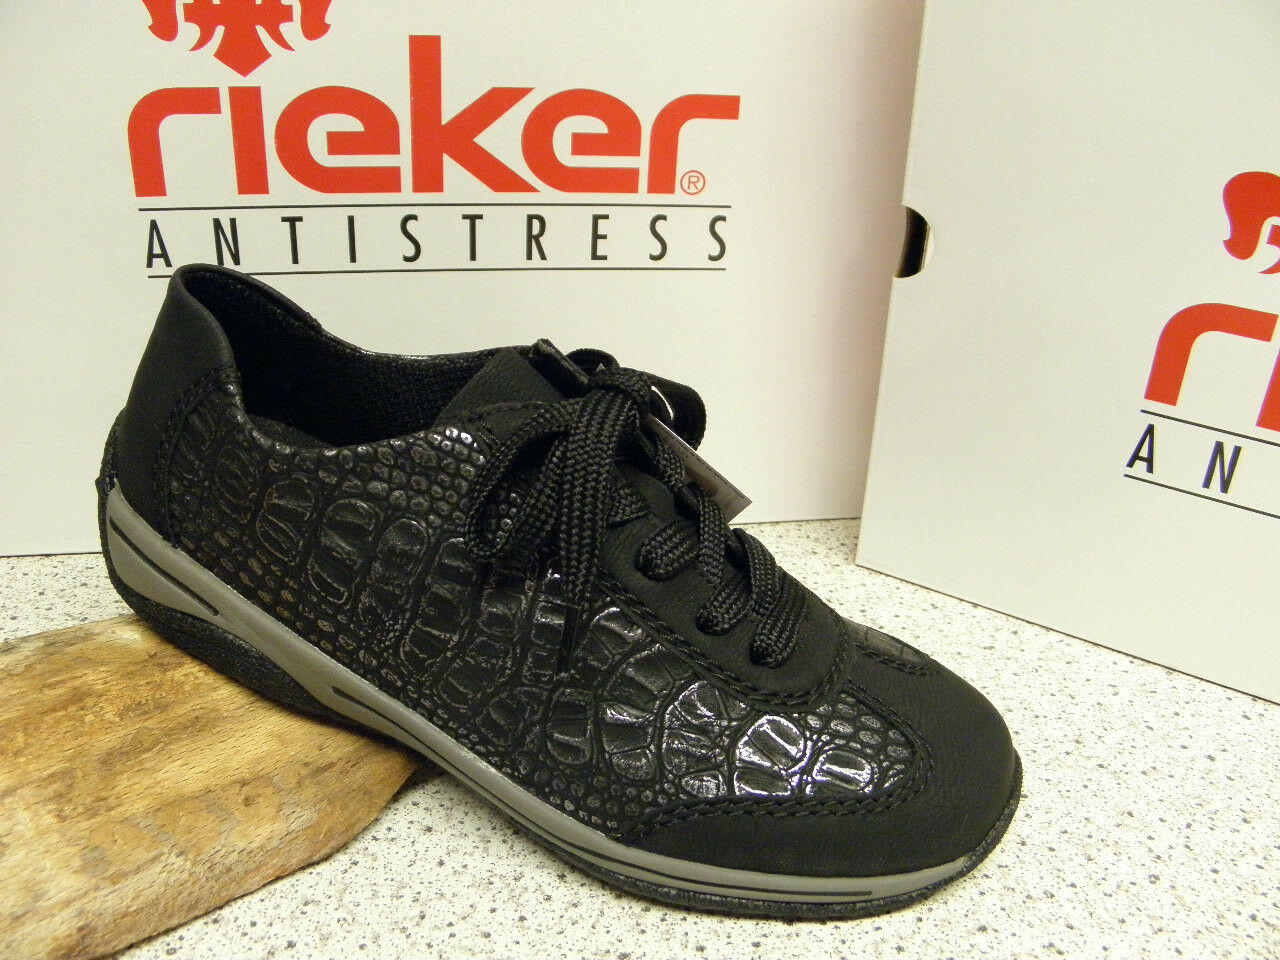 rieker ®  SALE,  schwarz, modisch,  superbequem, Top Preis,  L5222-00 (R266)